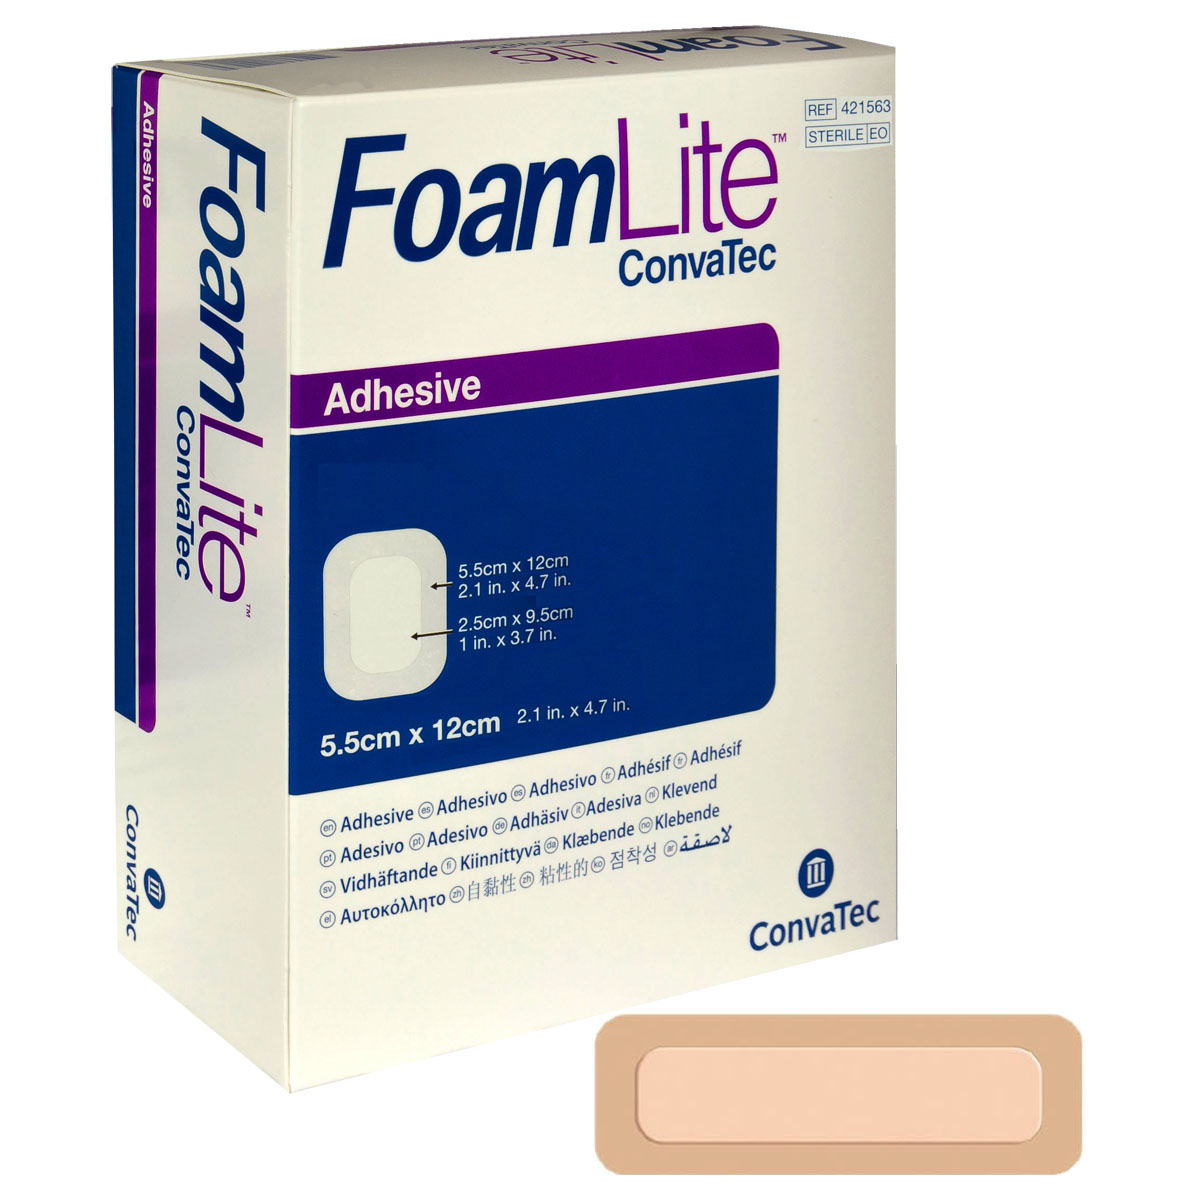 "FoamLite Foam Adhesive Dressing, Rectangle, 2"" x 4.8"" 51421563"